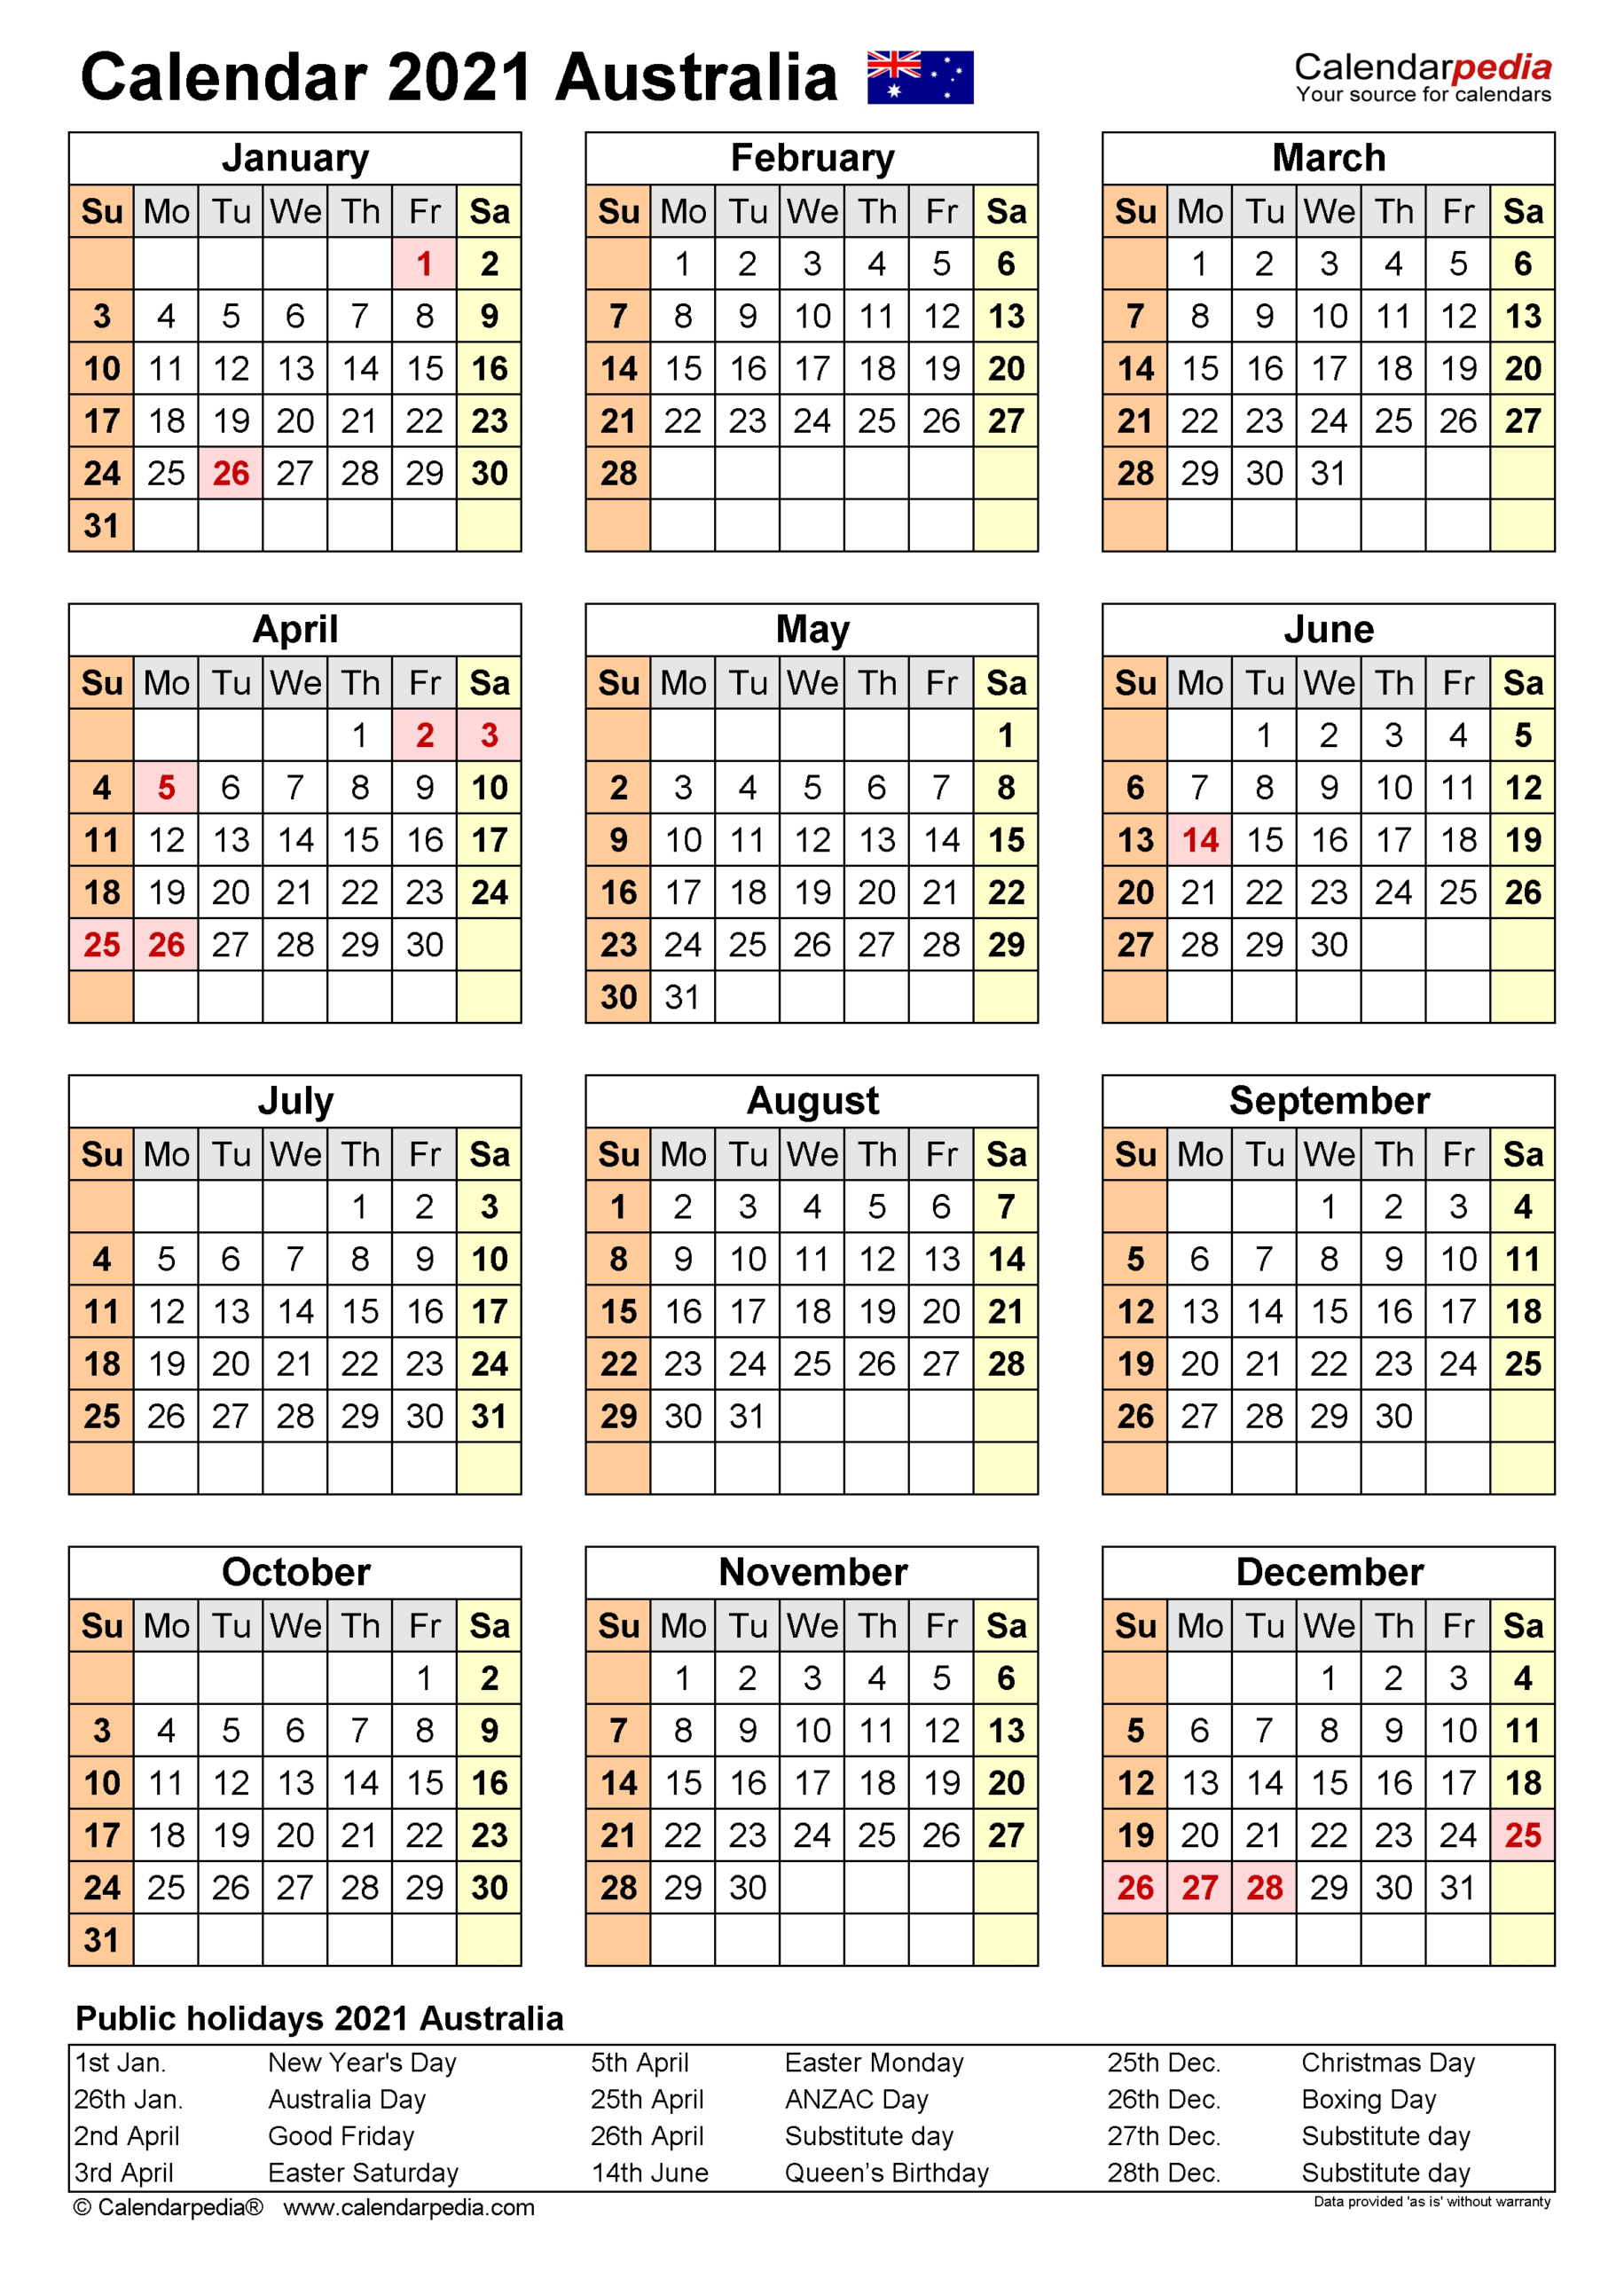 Depo Provera Calendar 2021 Printable   Calendar Printables